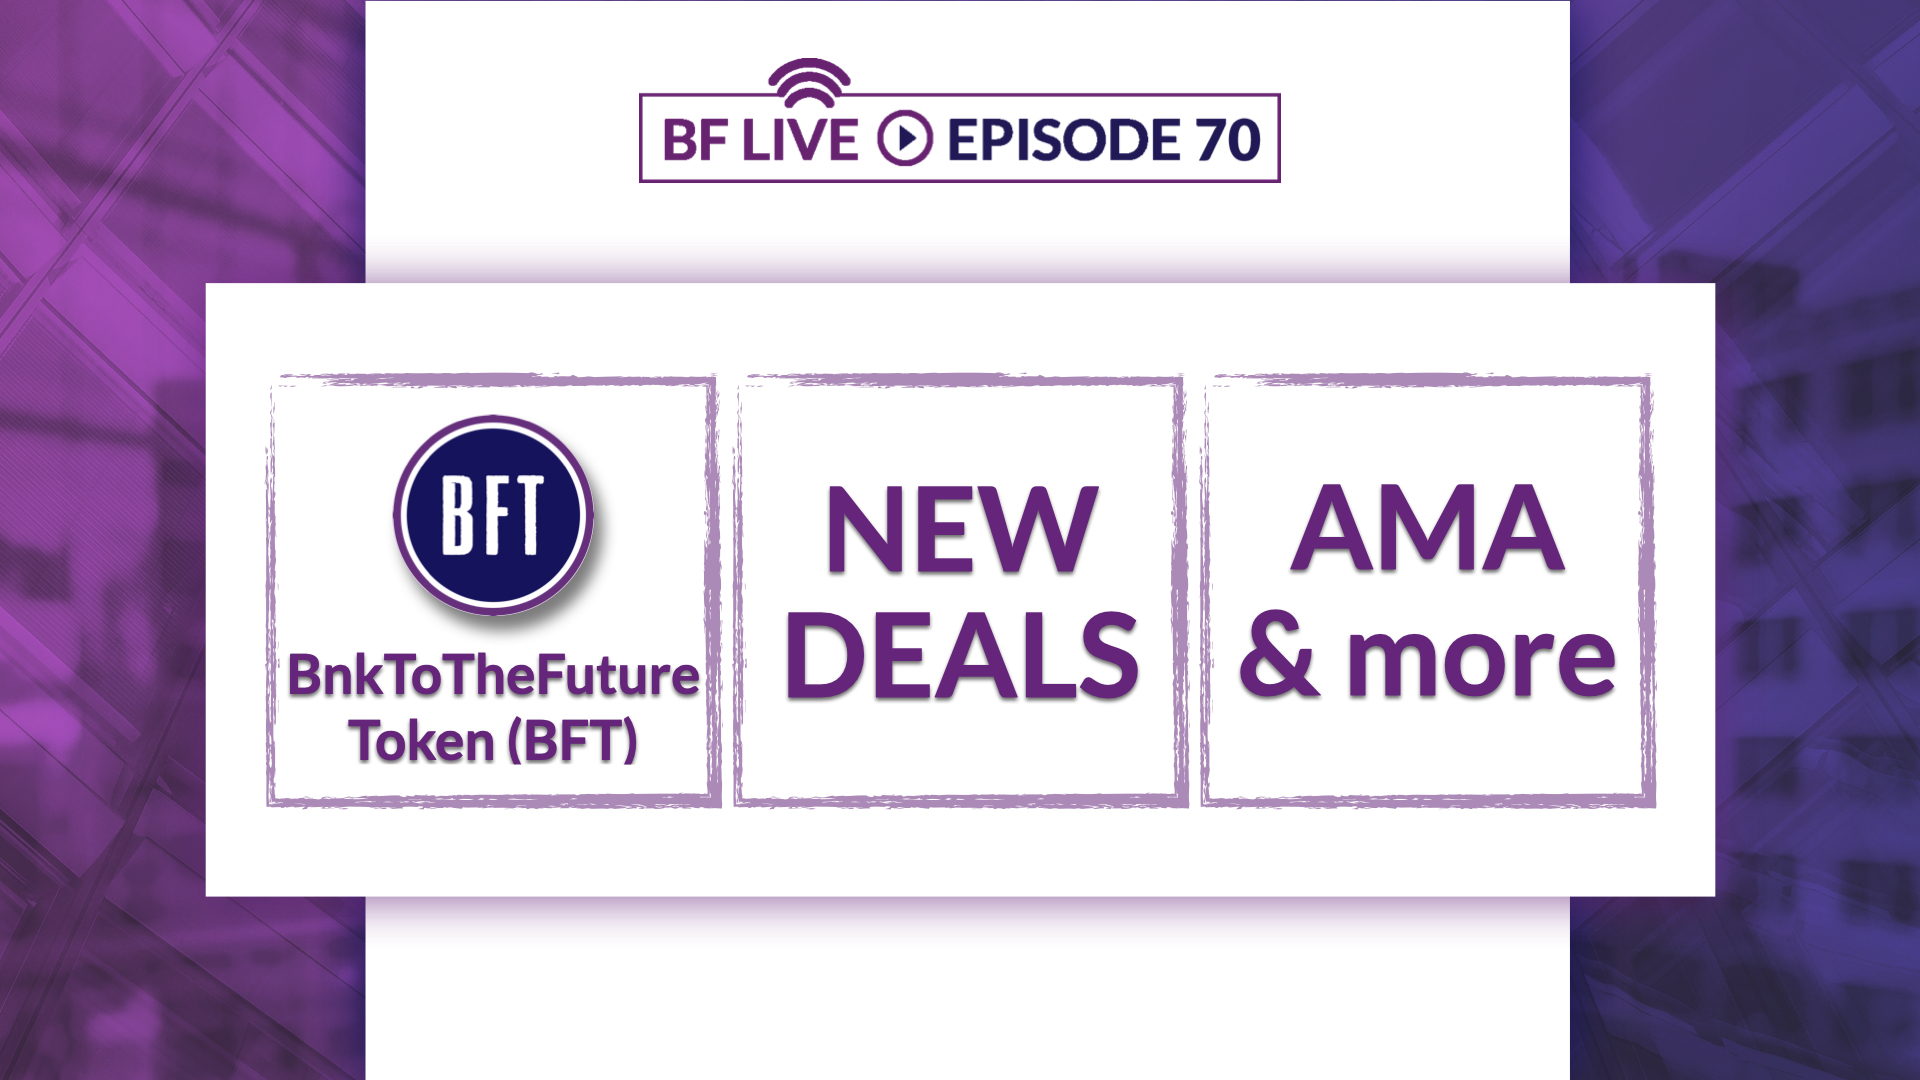 BnkToTheFuture Token (BFT), New Deals, AMA & more | BnkToTheFuture (BF)Live Ep 70